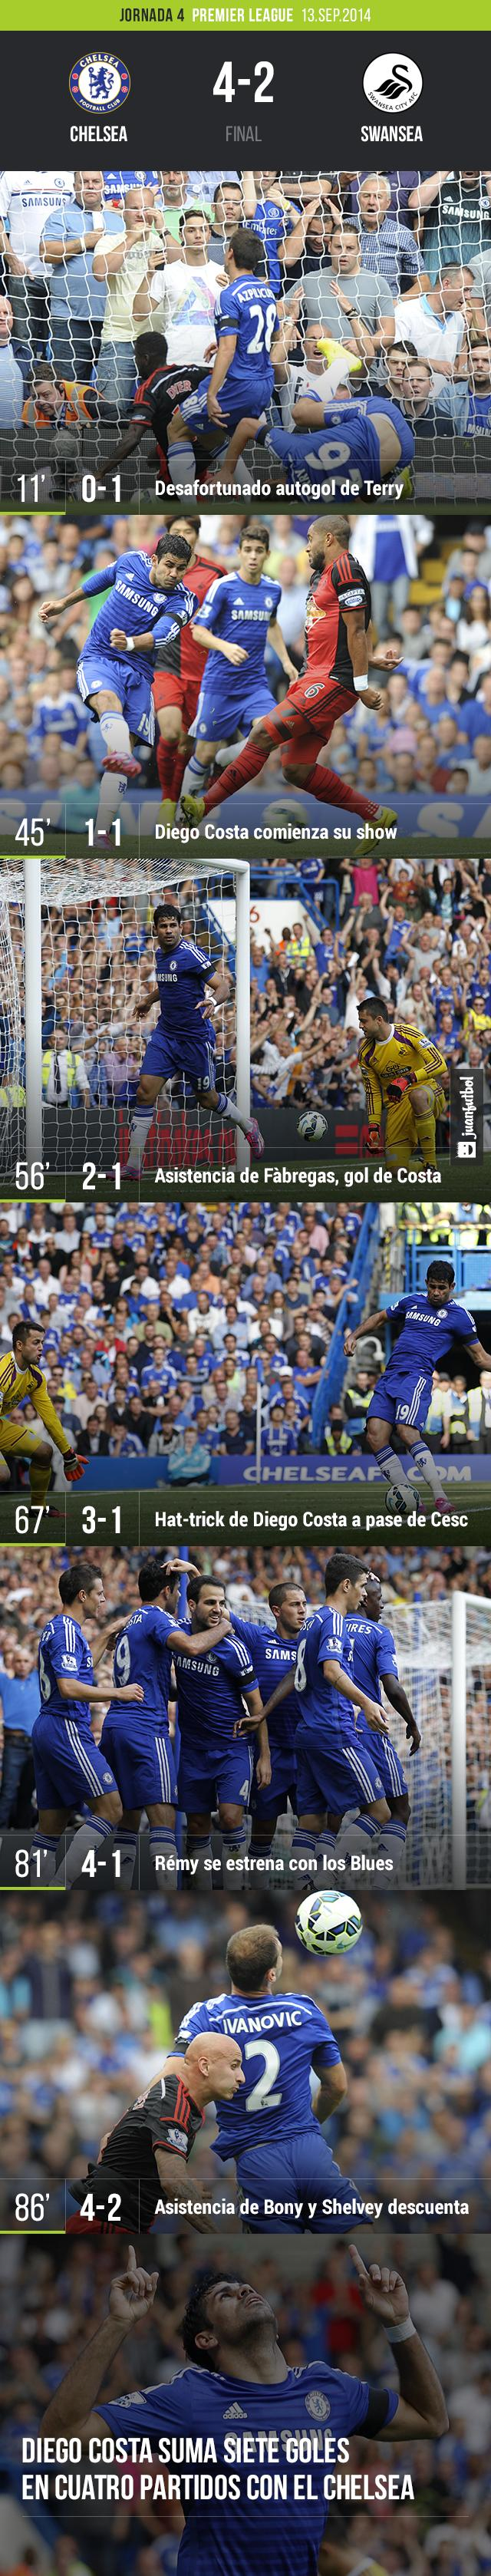 Chelsea 4-2 Swansea